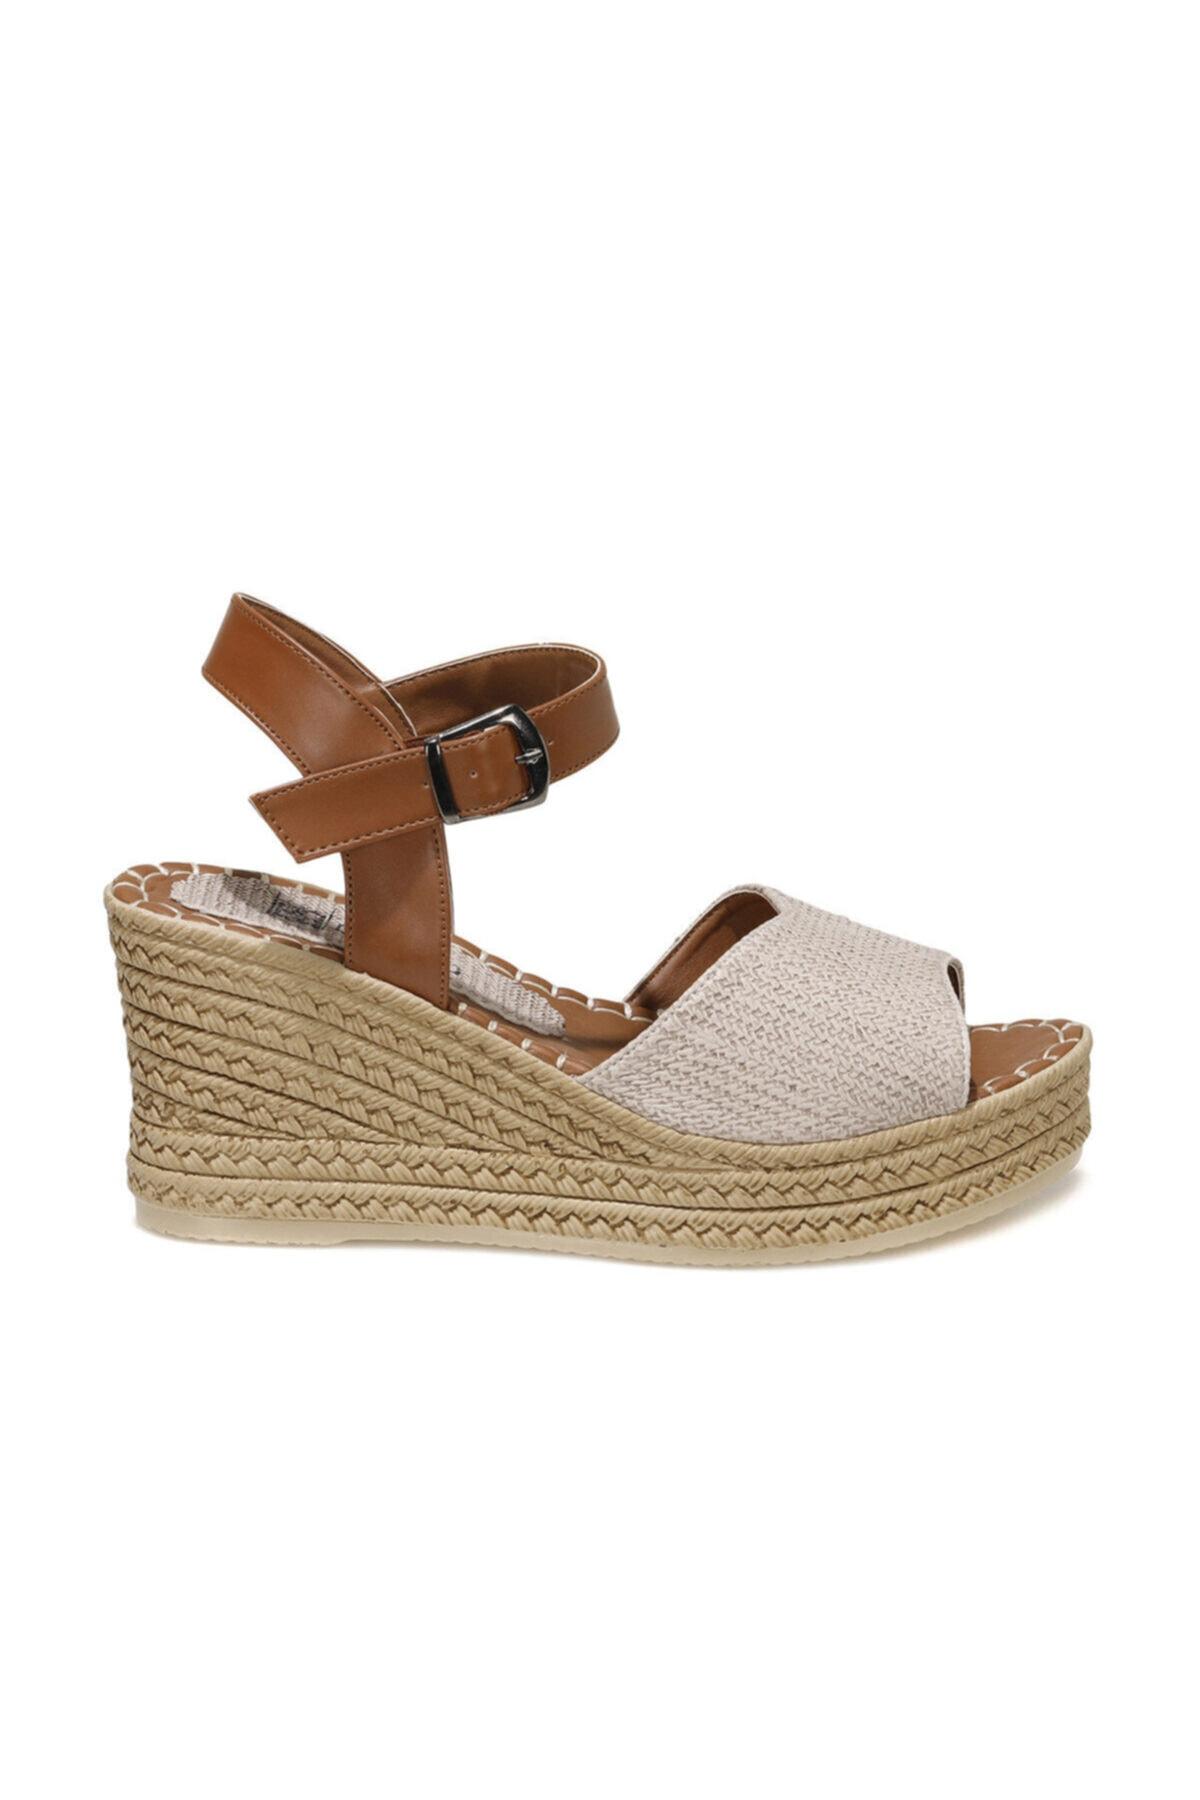 MELİSSA 1FX Bej Kadın Dolgu Topuklu Sandalet 101045555